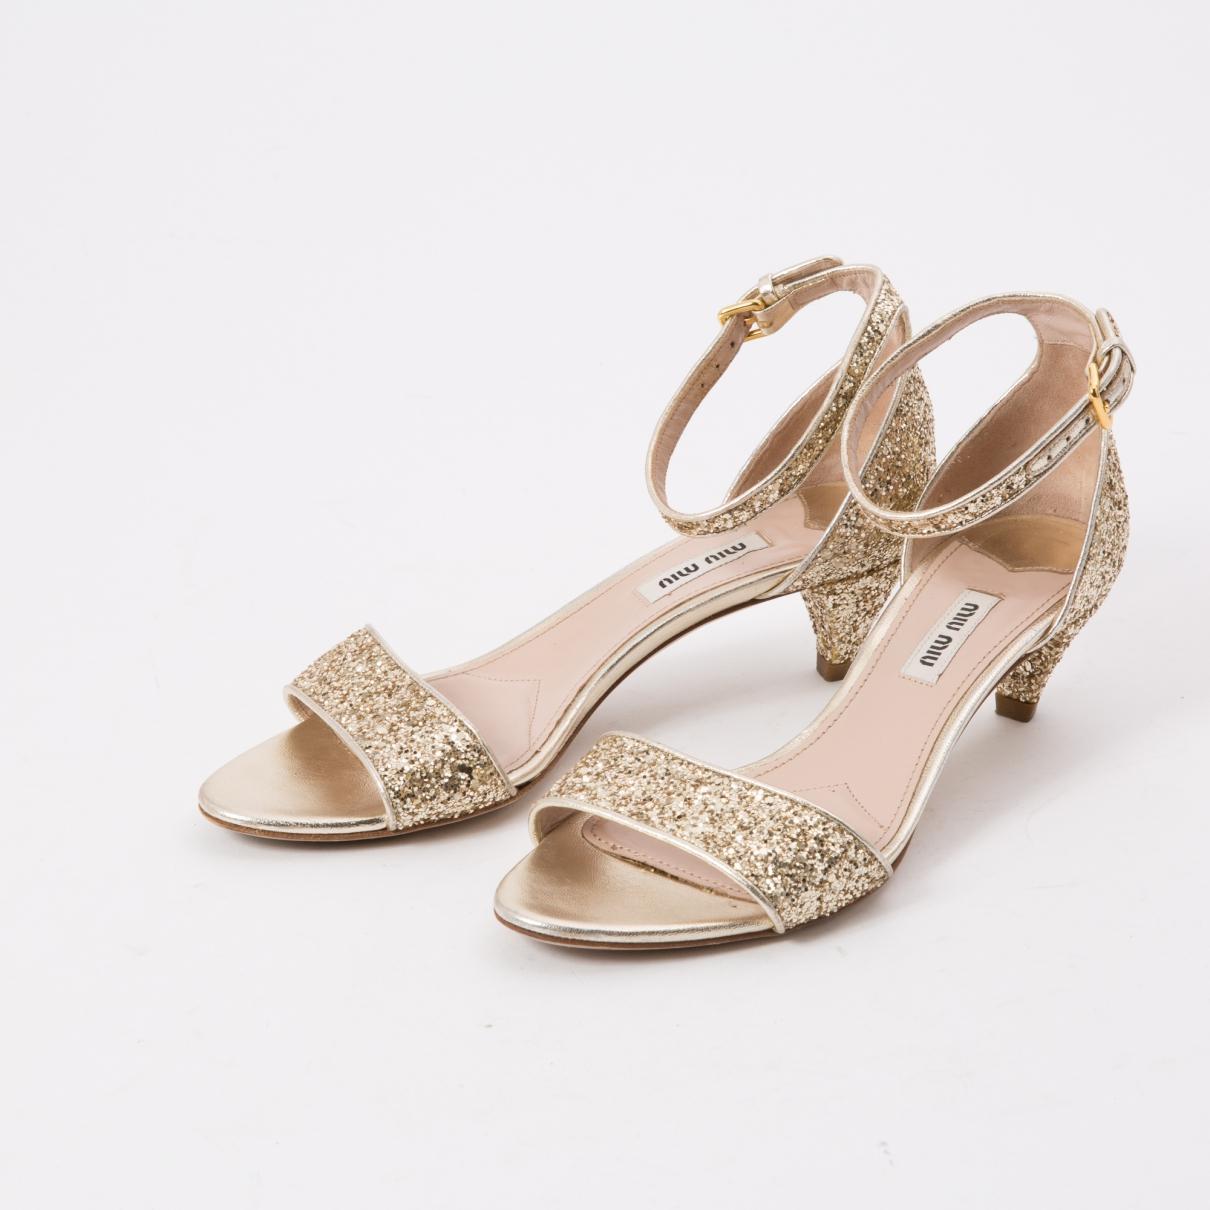 66d79672c7e Miu Miu - Metallic Glitter Sandals - Lyst. View fullscreen